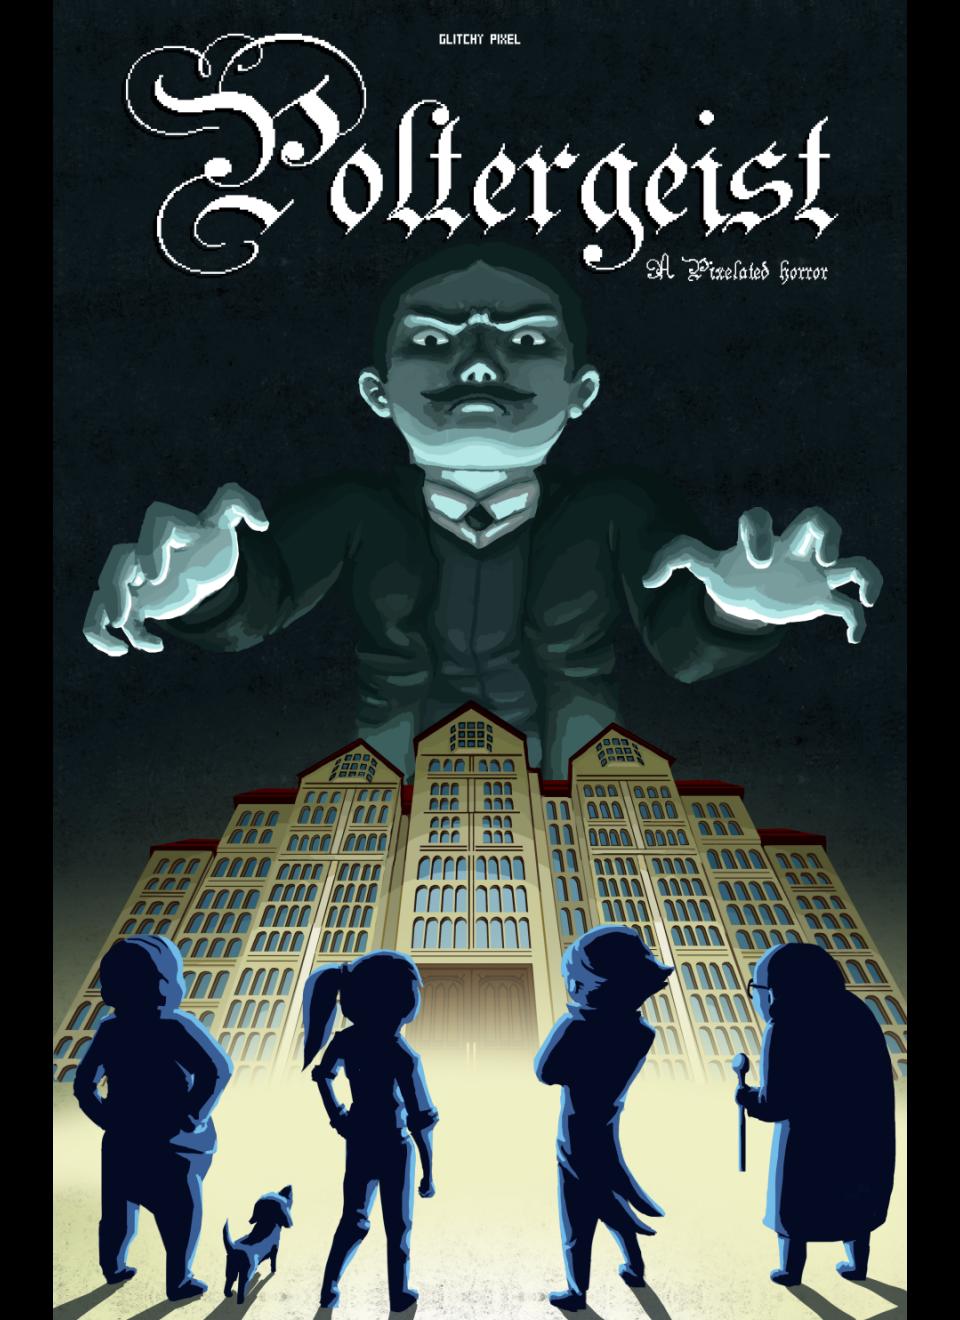 Poltergeist: A Pixelated Horror Windows, Mac, Linux, VITA game - Indie DB